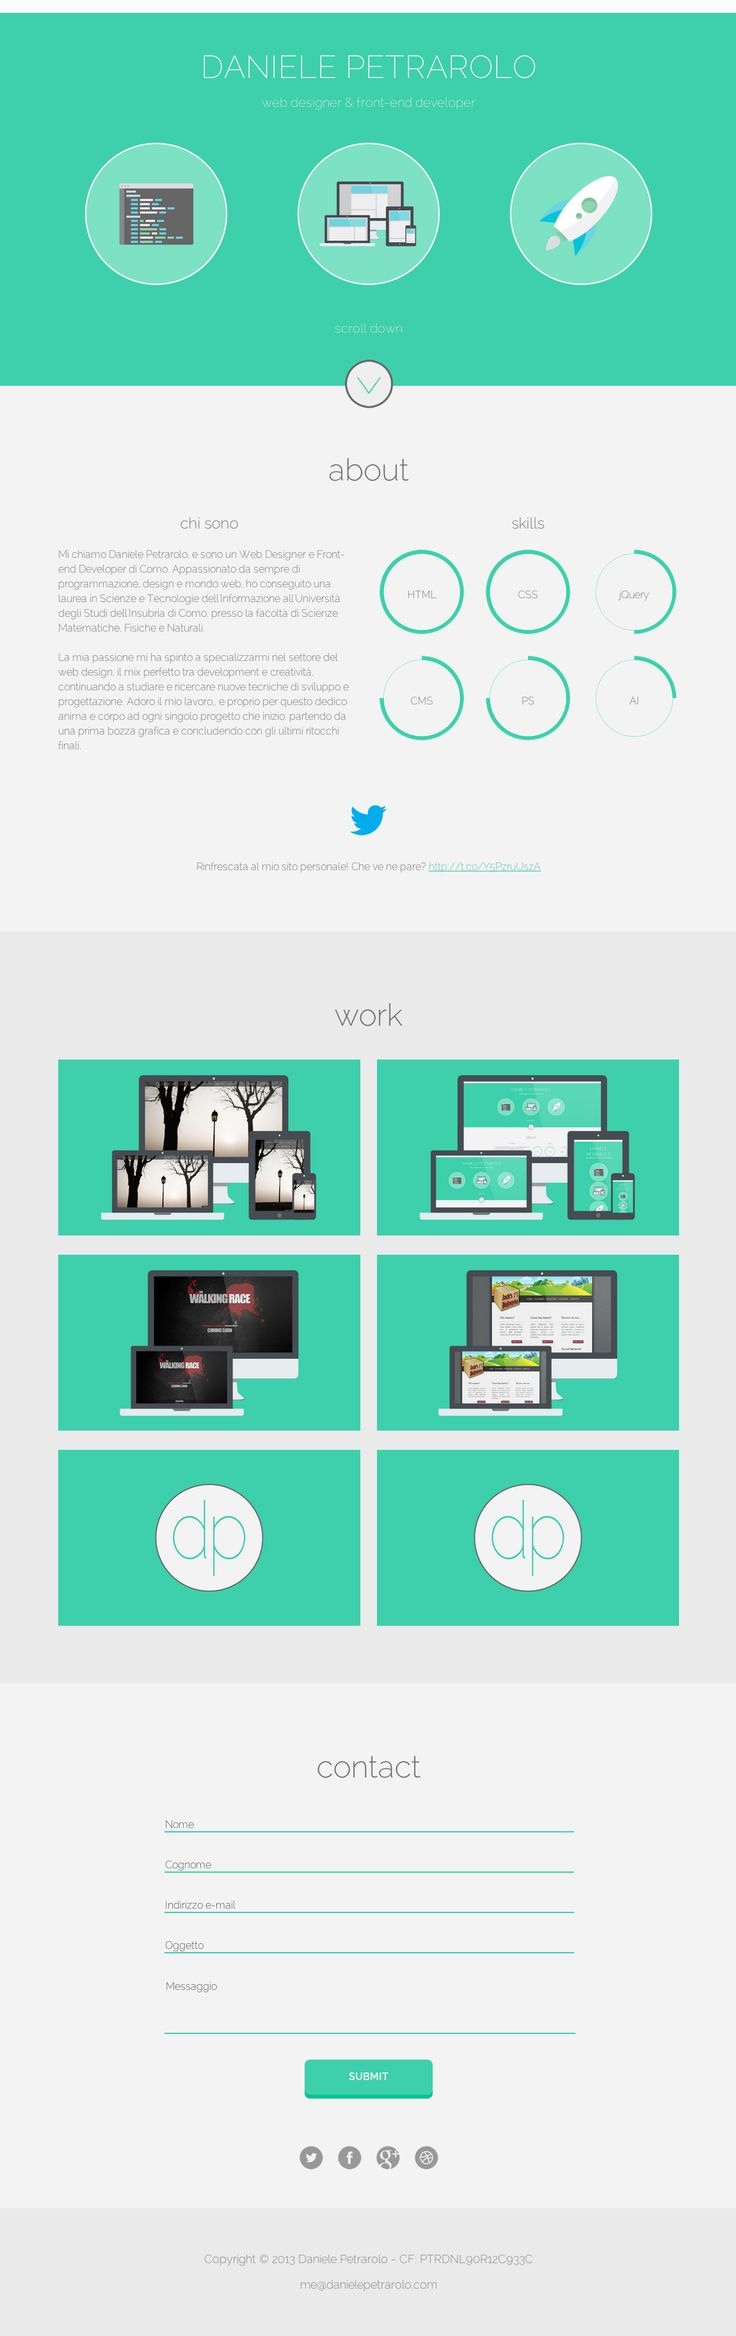 Cassandra cappello graphic design toronto - Responsive One Pager With A Slick Flat Design For Designer Daniele Petrarolo Loving How Crisp